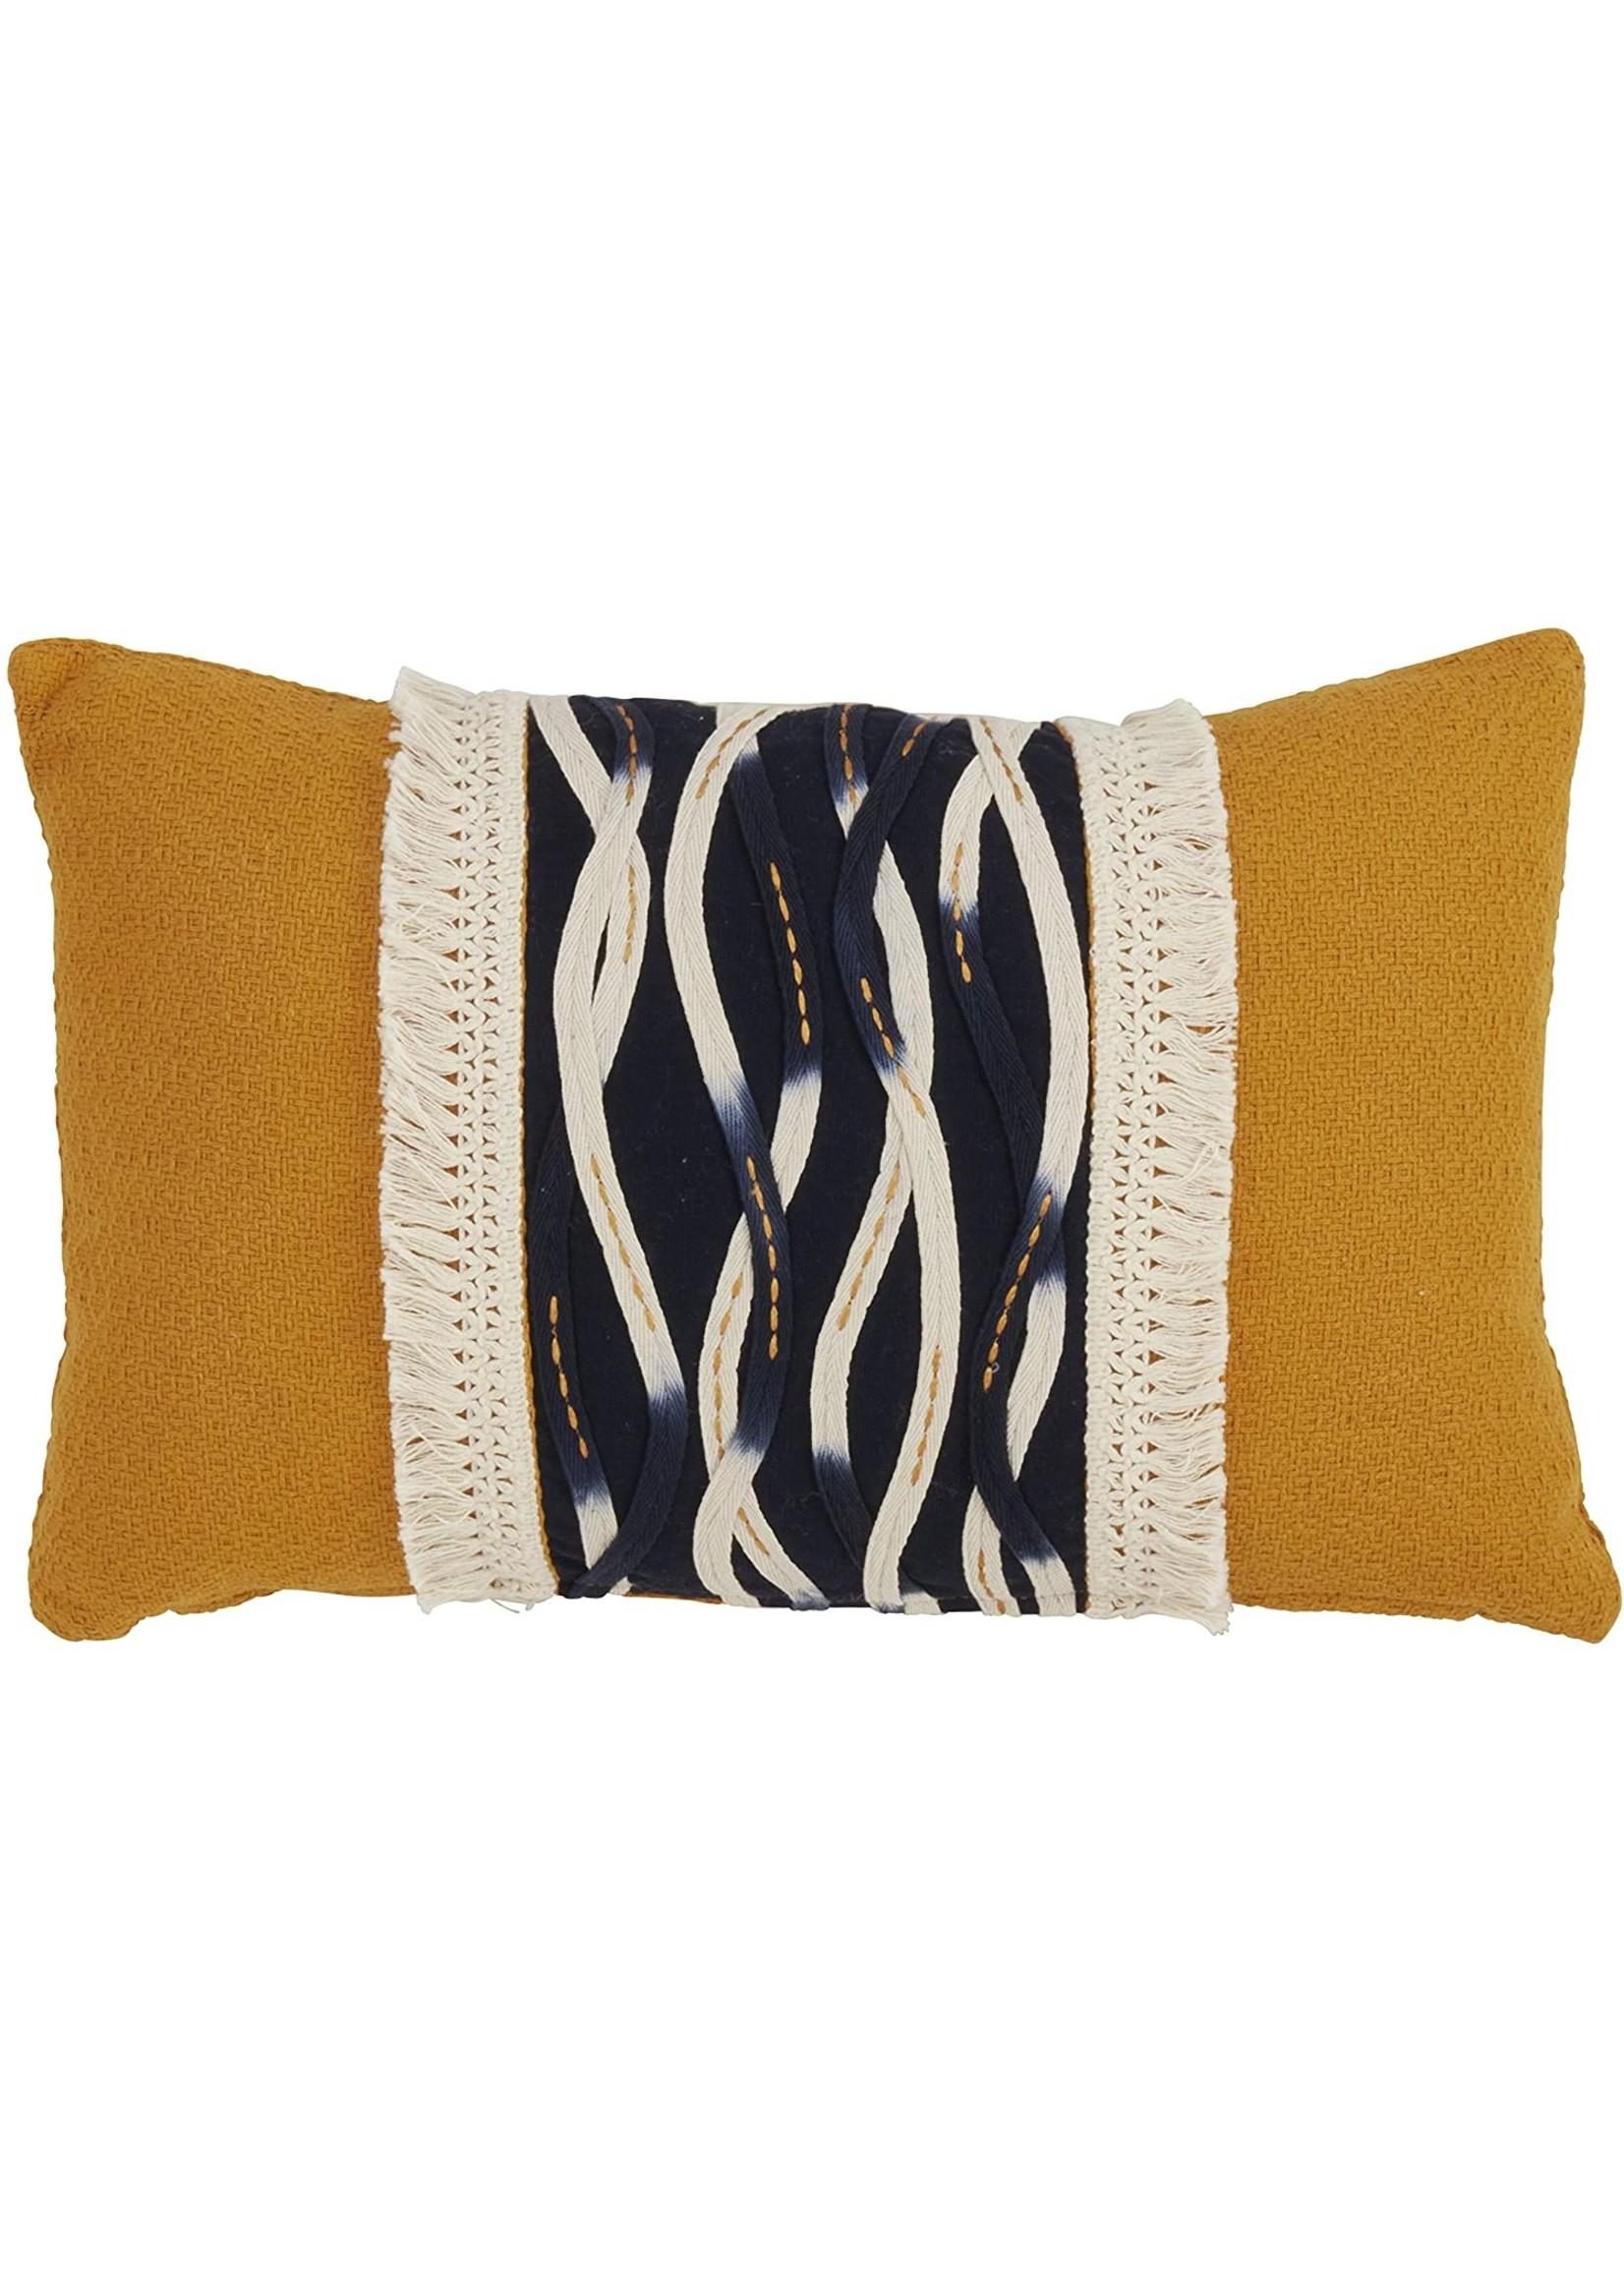 Saro Wavy Stitched Pillow Mustard